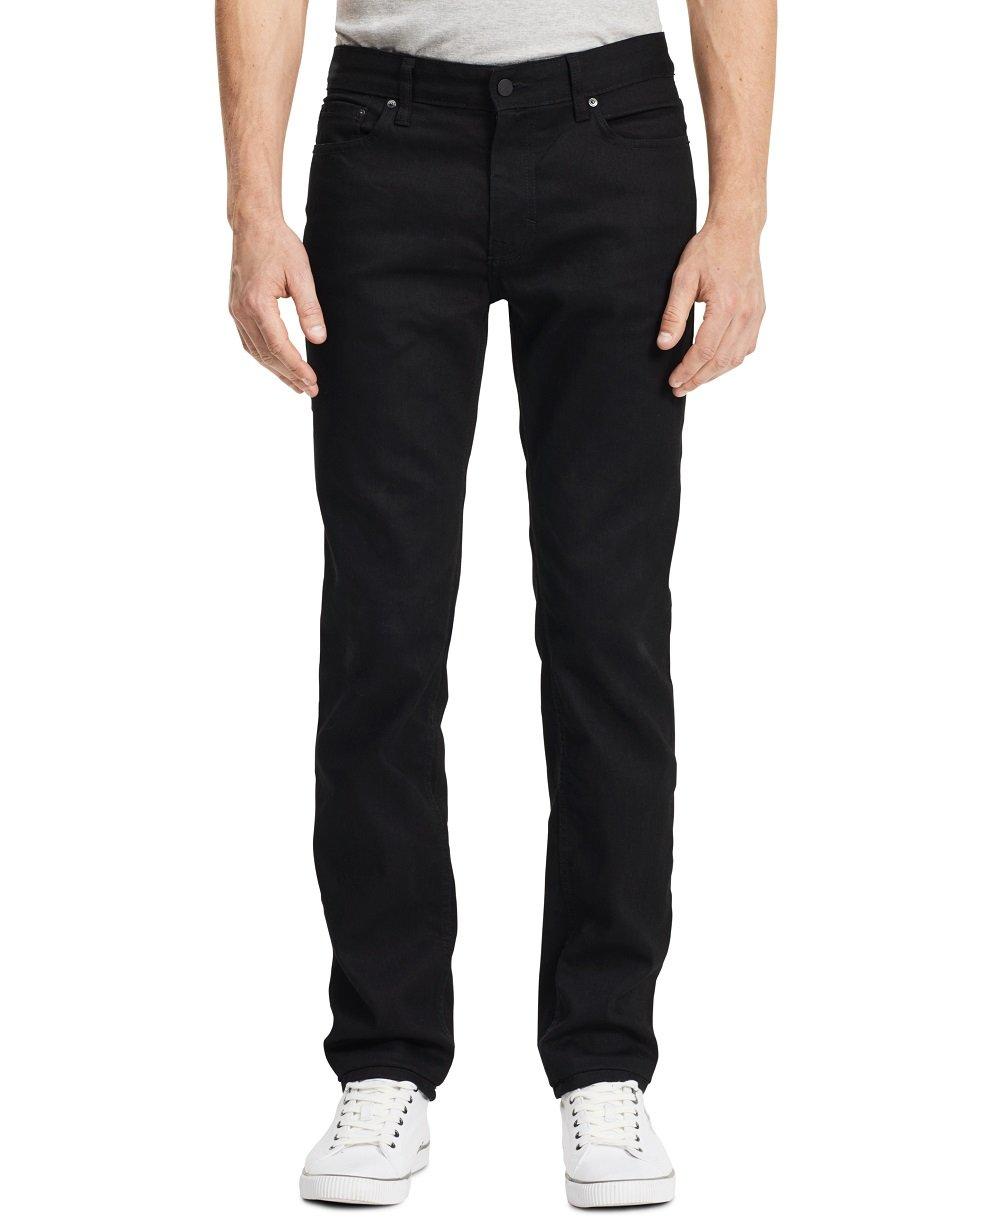 Calvin Klein Men's Slim Straight Fit Denim Jean, Black, 34x32